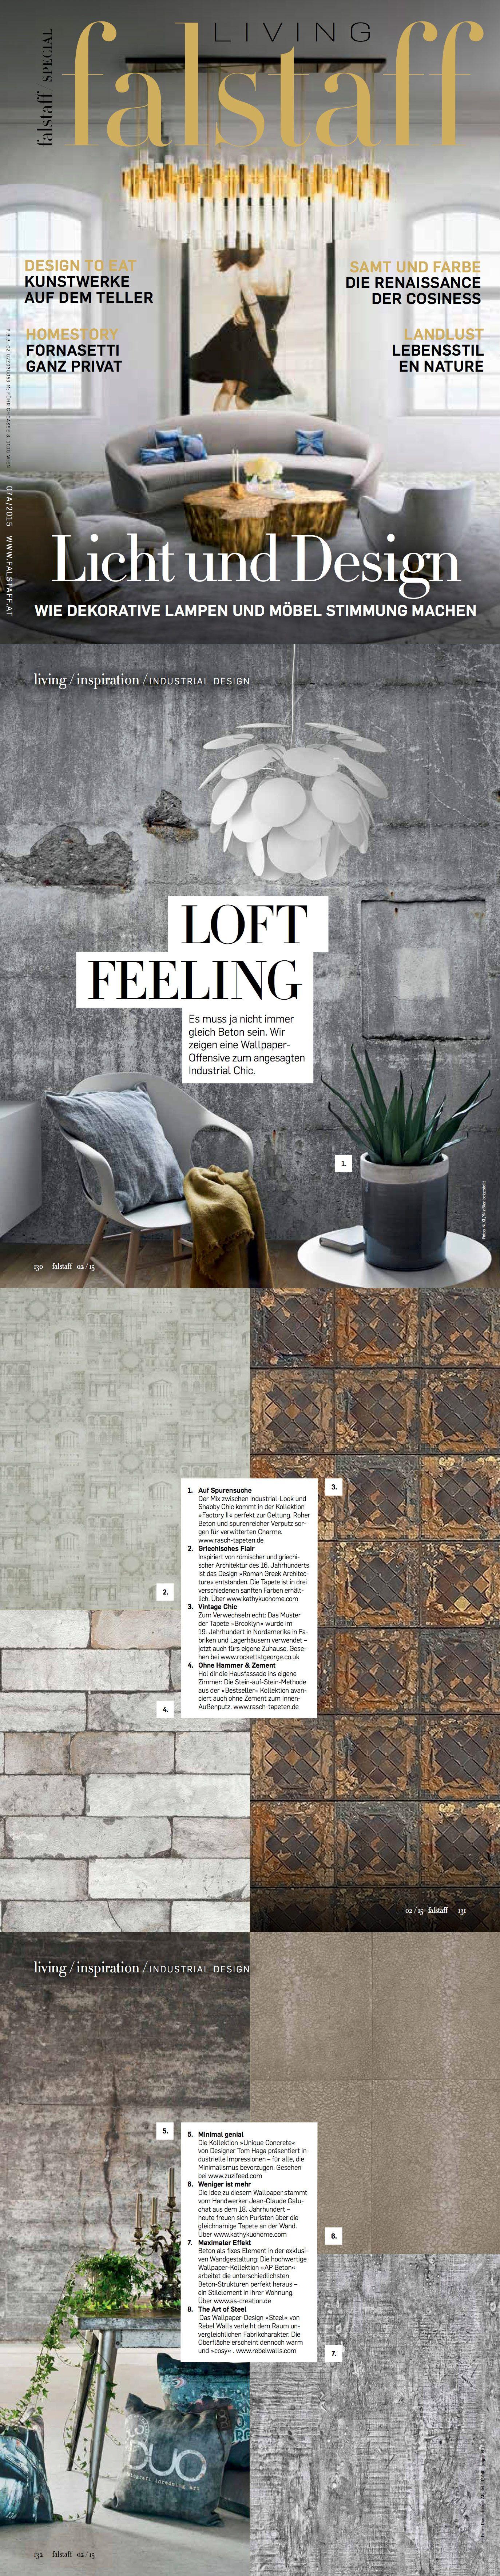 architecture blueprints wallpaper. Falstaff Living: Fall 2015 Roman Greek Architecture Blueprint Drawings  Wallpaper - Pencil And Galuchat Industrial Architecture Blueprints Wallpaper